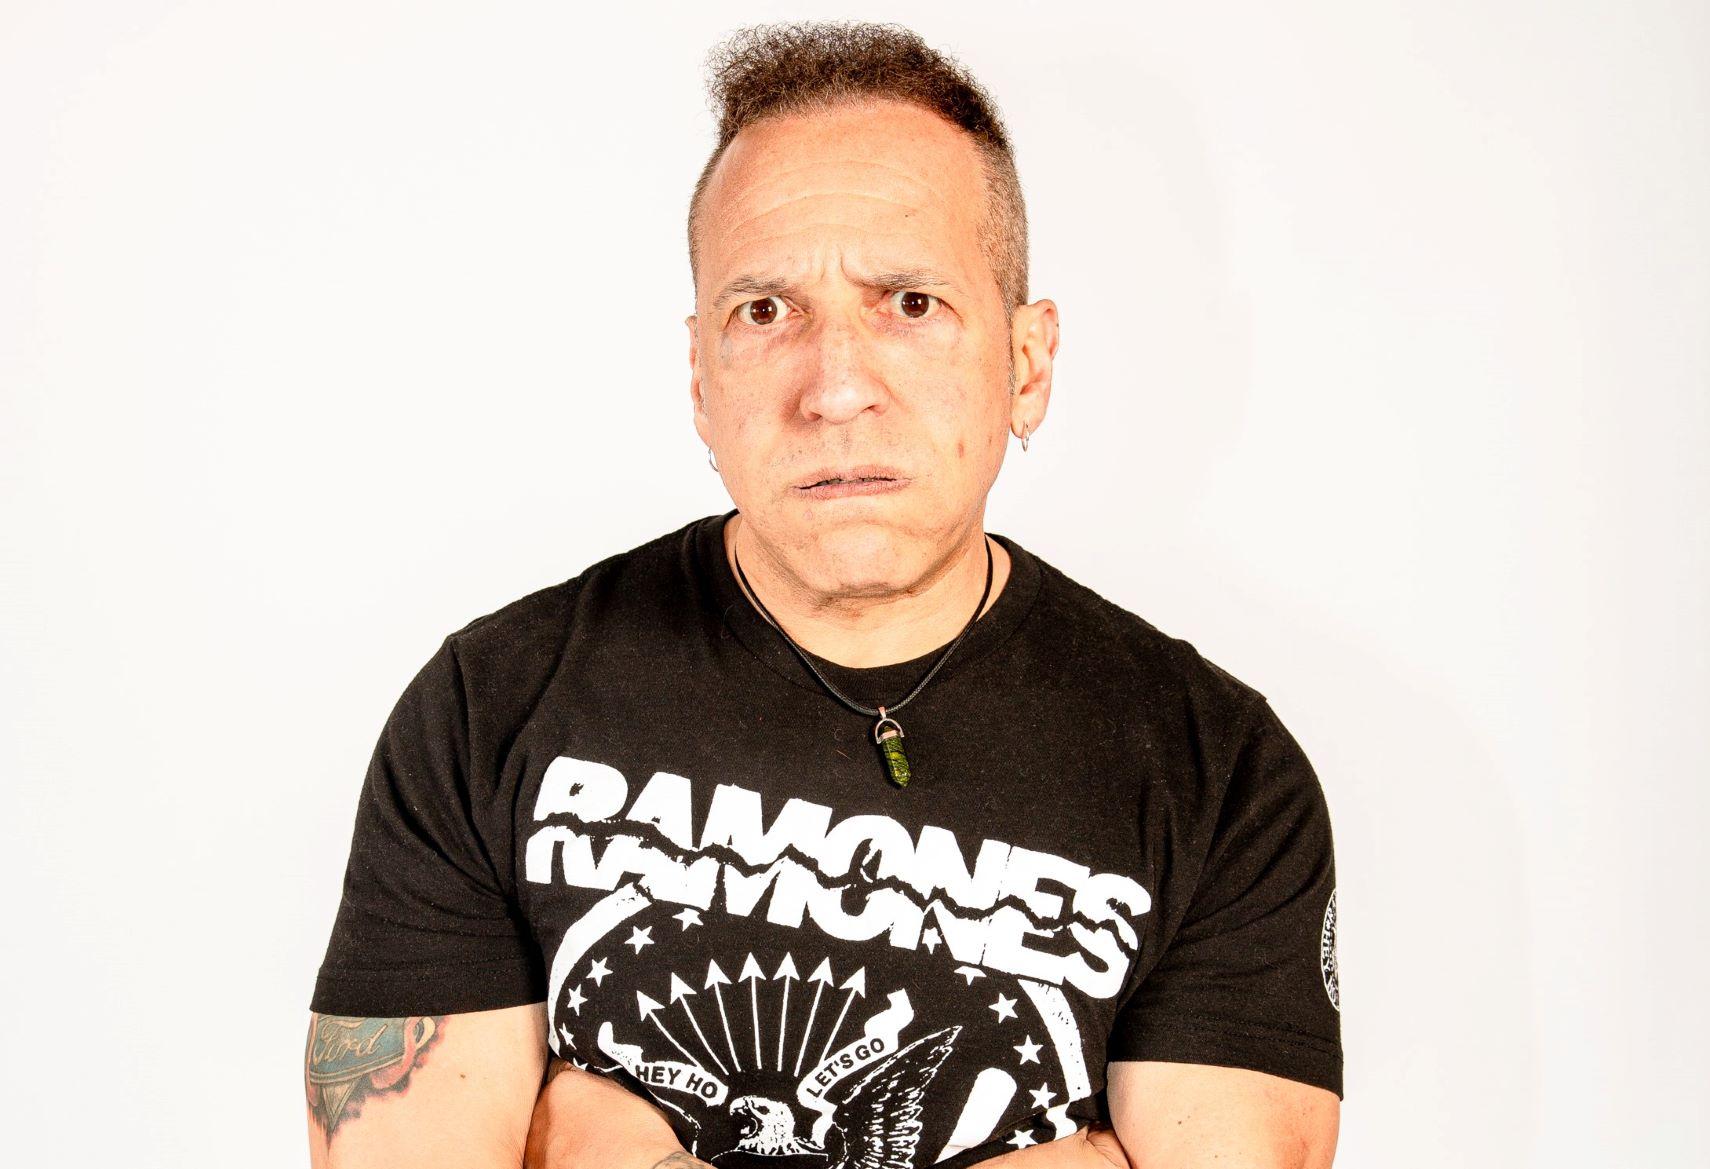 PODCAST – Wednesday, July 21: AJ's Bogus Stories; Comedian Jim Florentine; Dumb Ass News